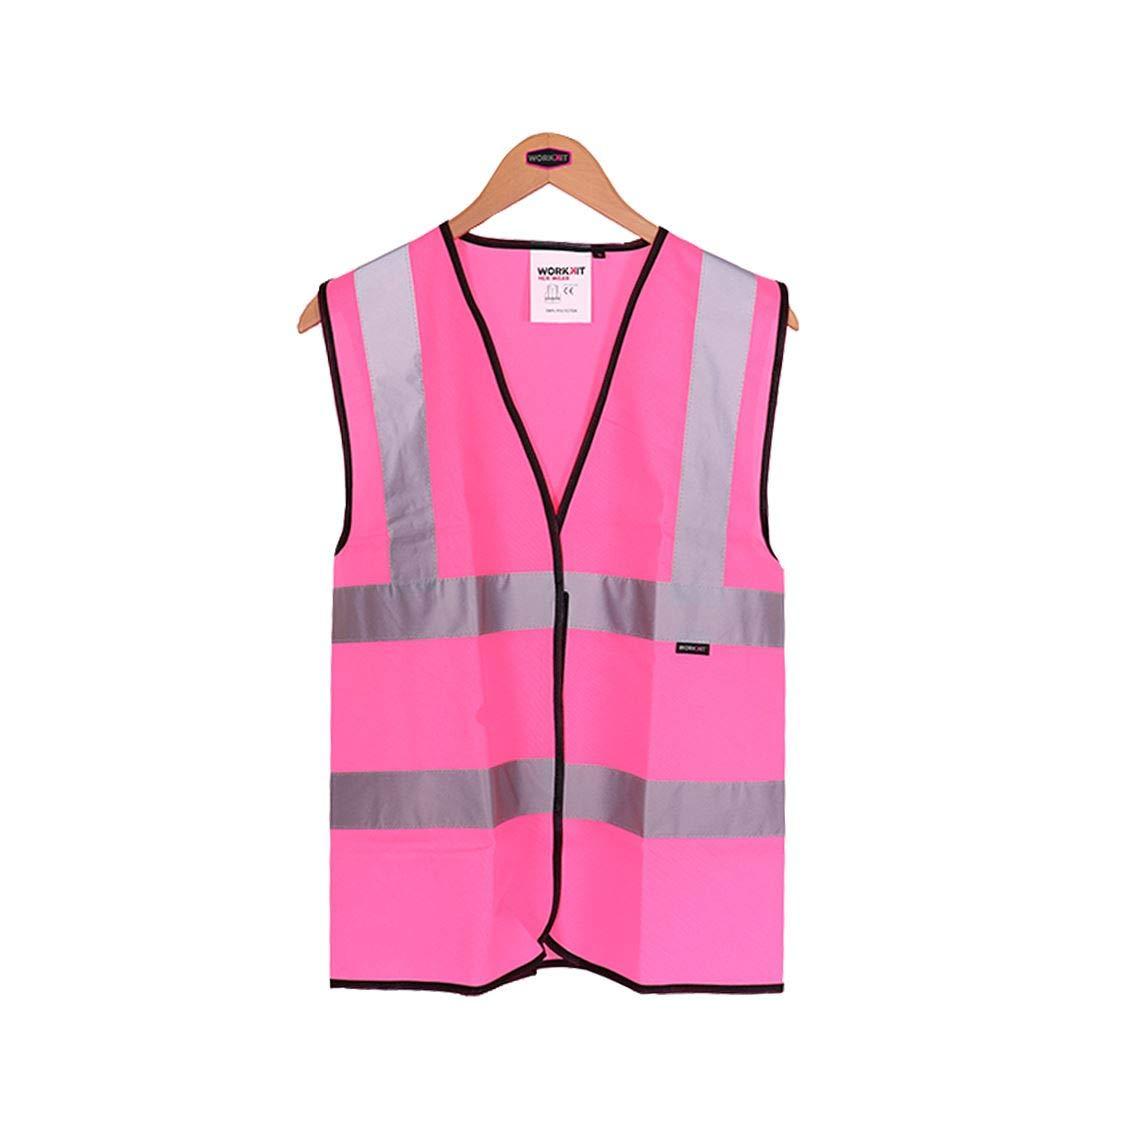 Womens Hi Vis Vest Pink